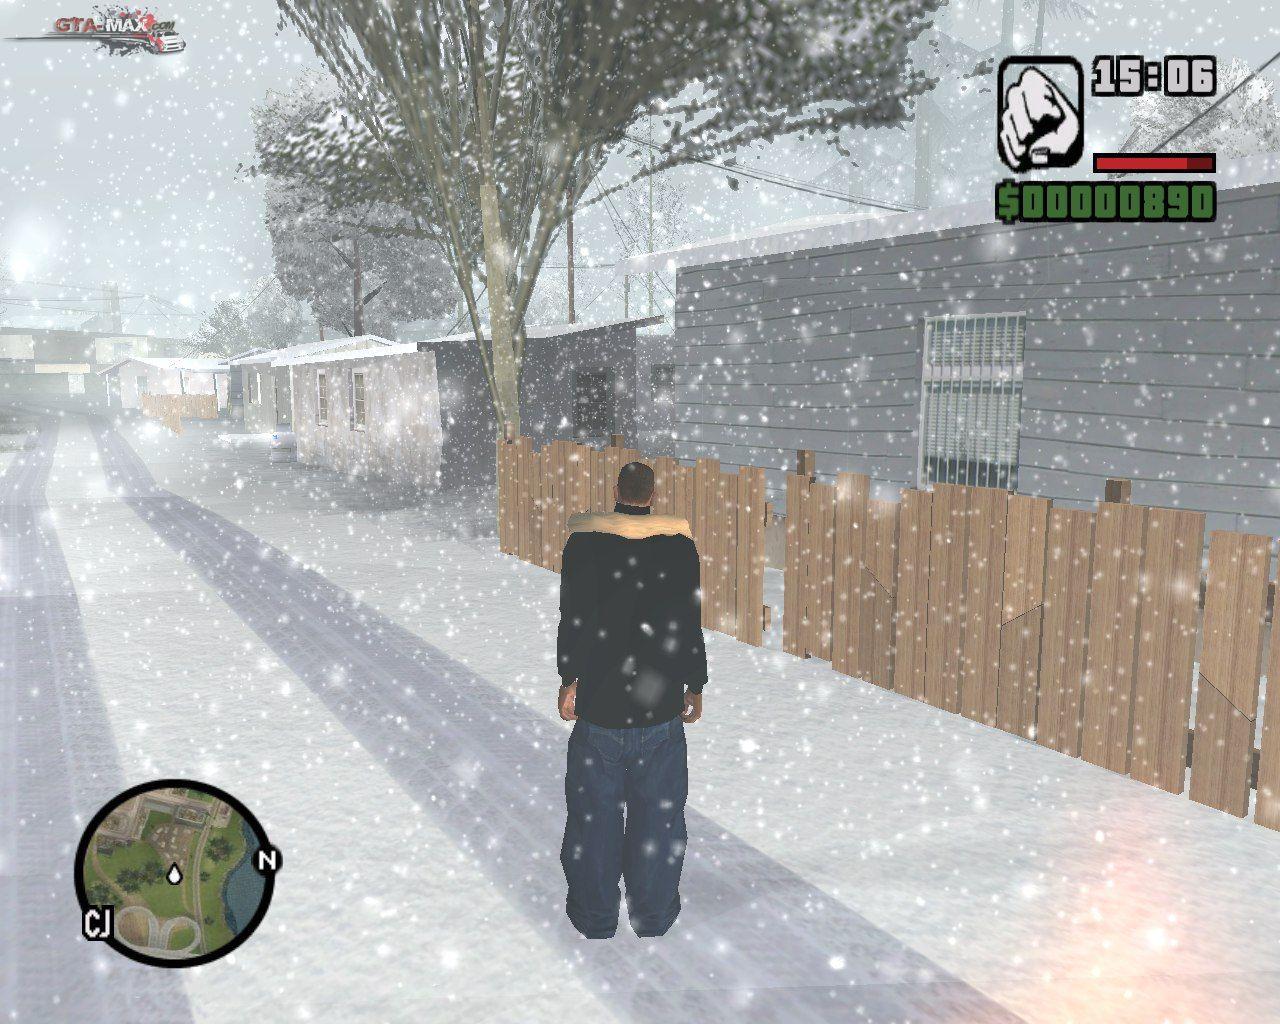 Gta san andreas наступила зима (2009) для gta san andreas.